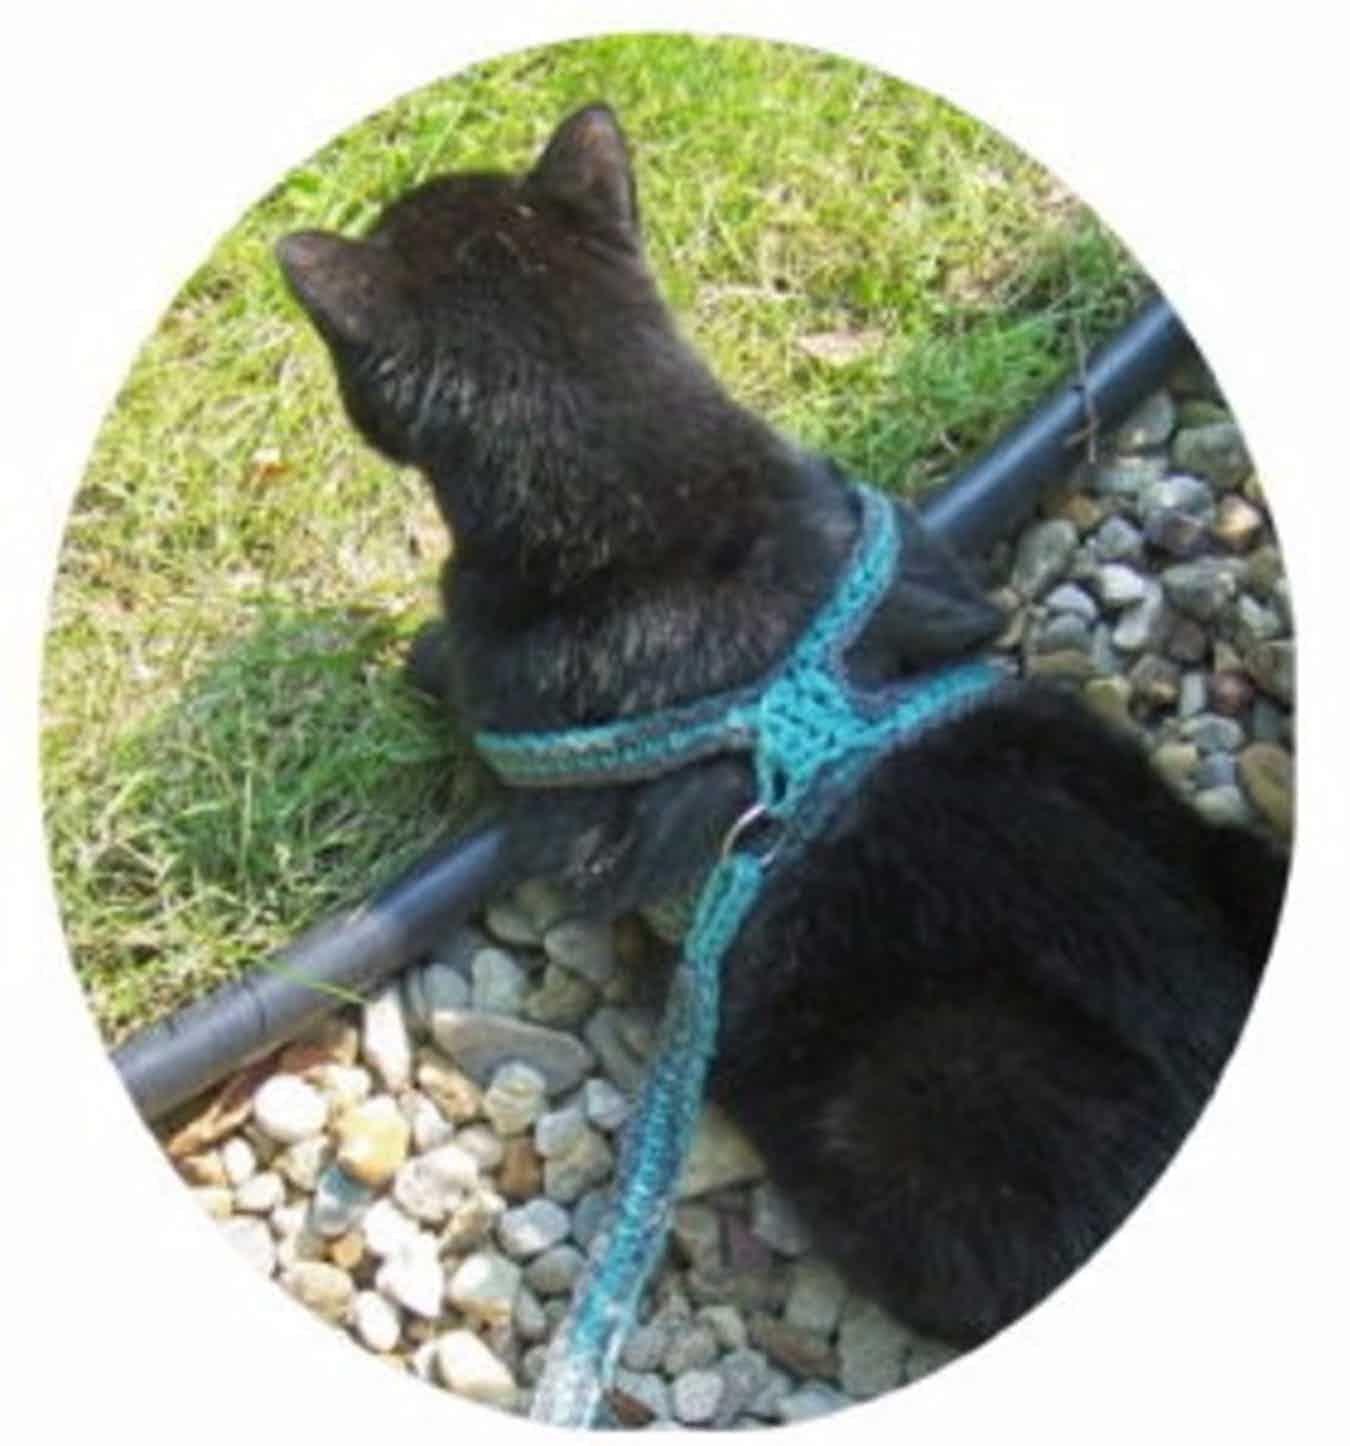 Crochet A Cat Harness Leash Craftbits Com Cat Harness Cat Hammock Pattern Crochet Cat